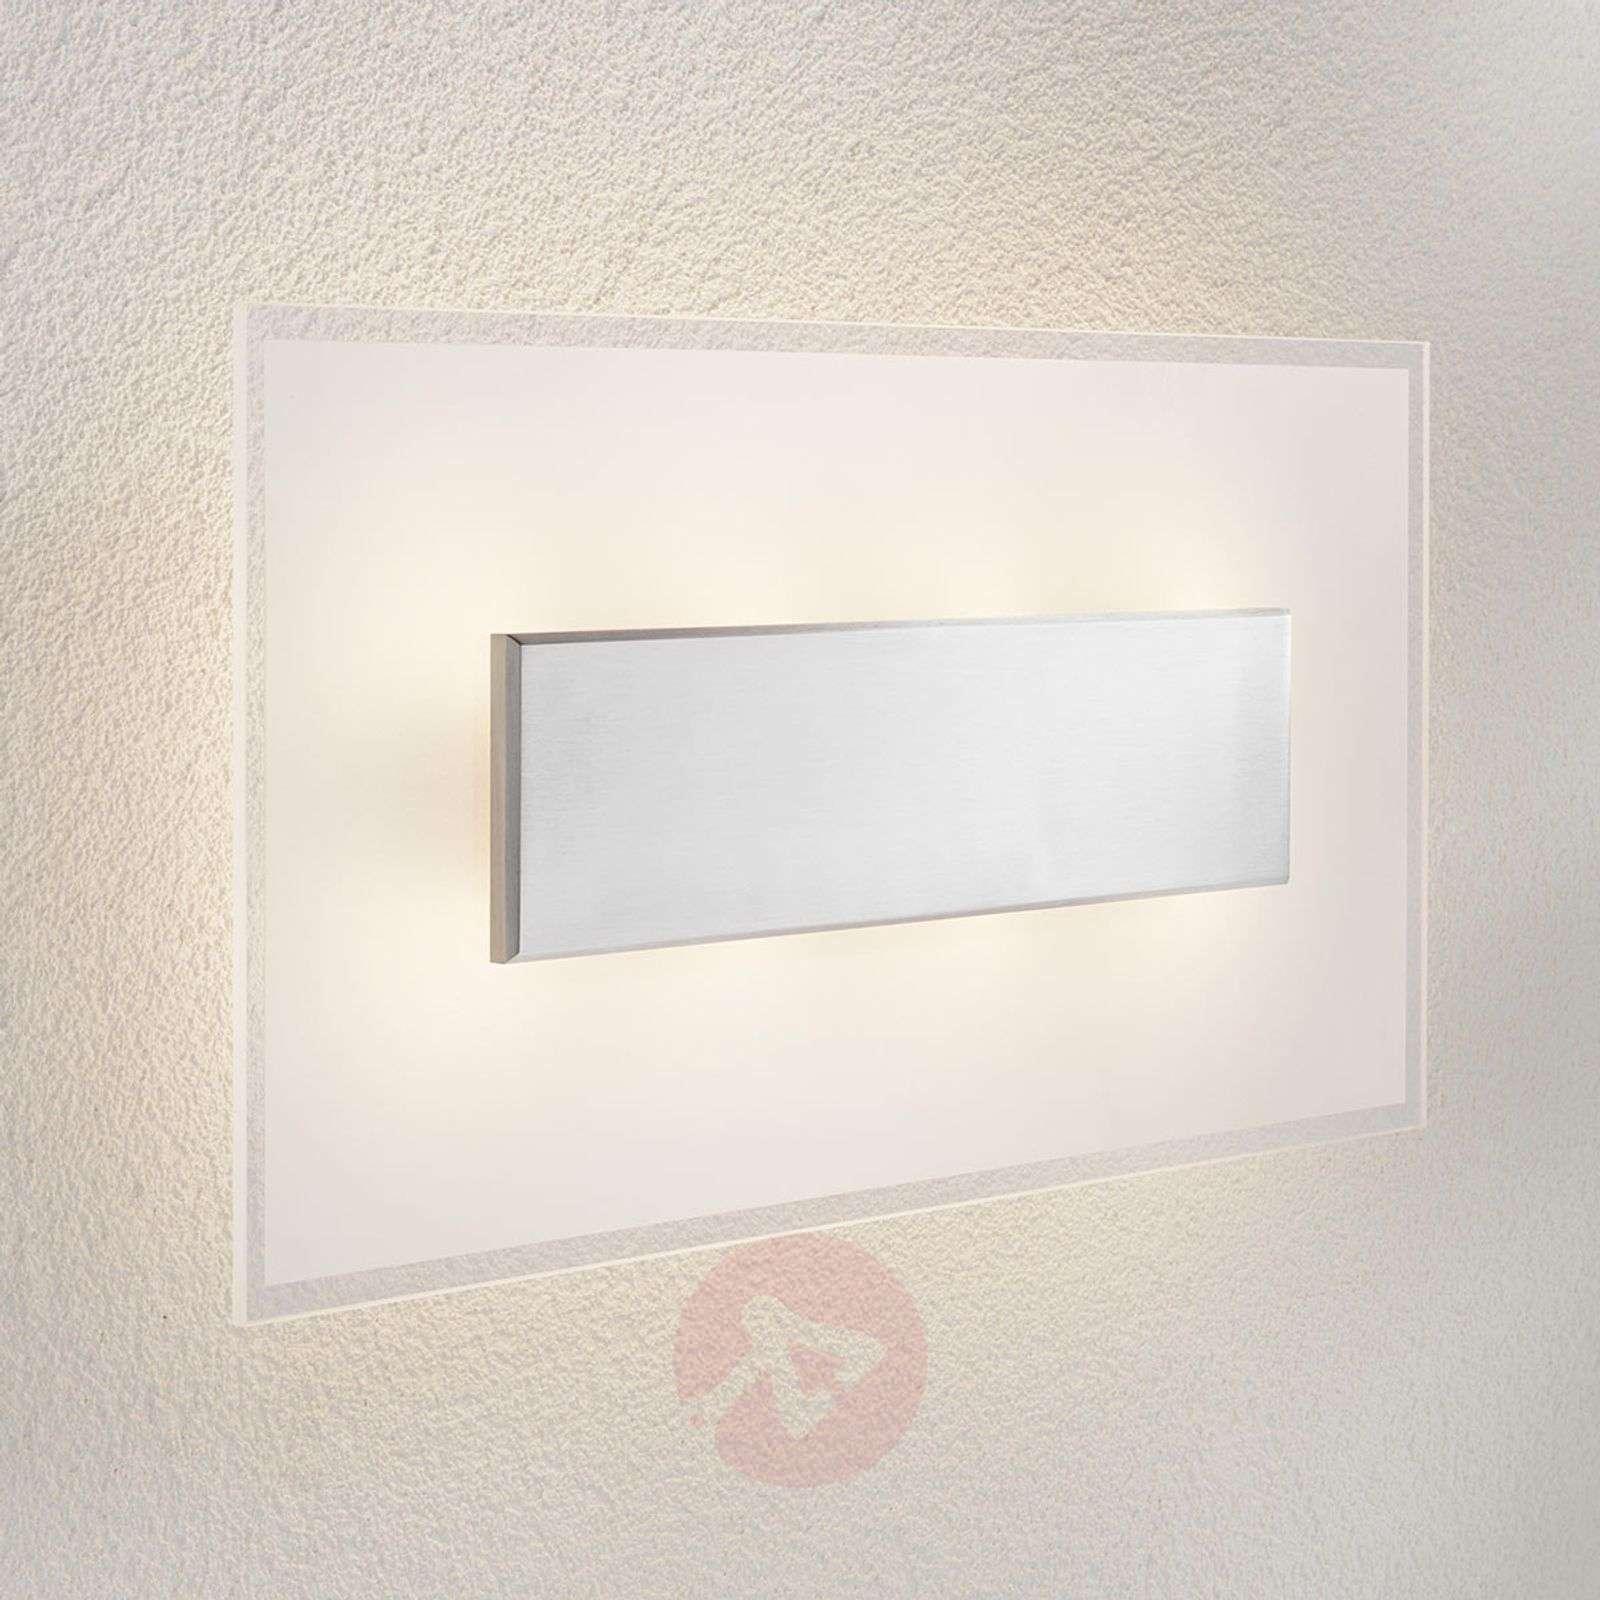 LED-kattovalaisin Lole, lasivarjostin, 59 x 29 cm-6722527-01